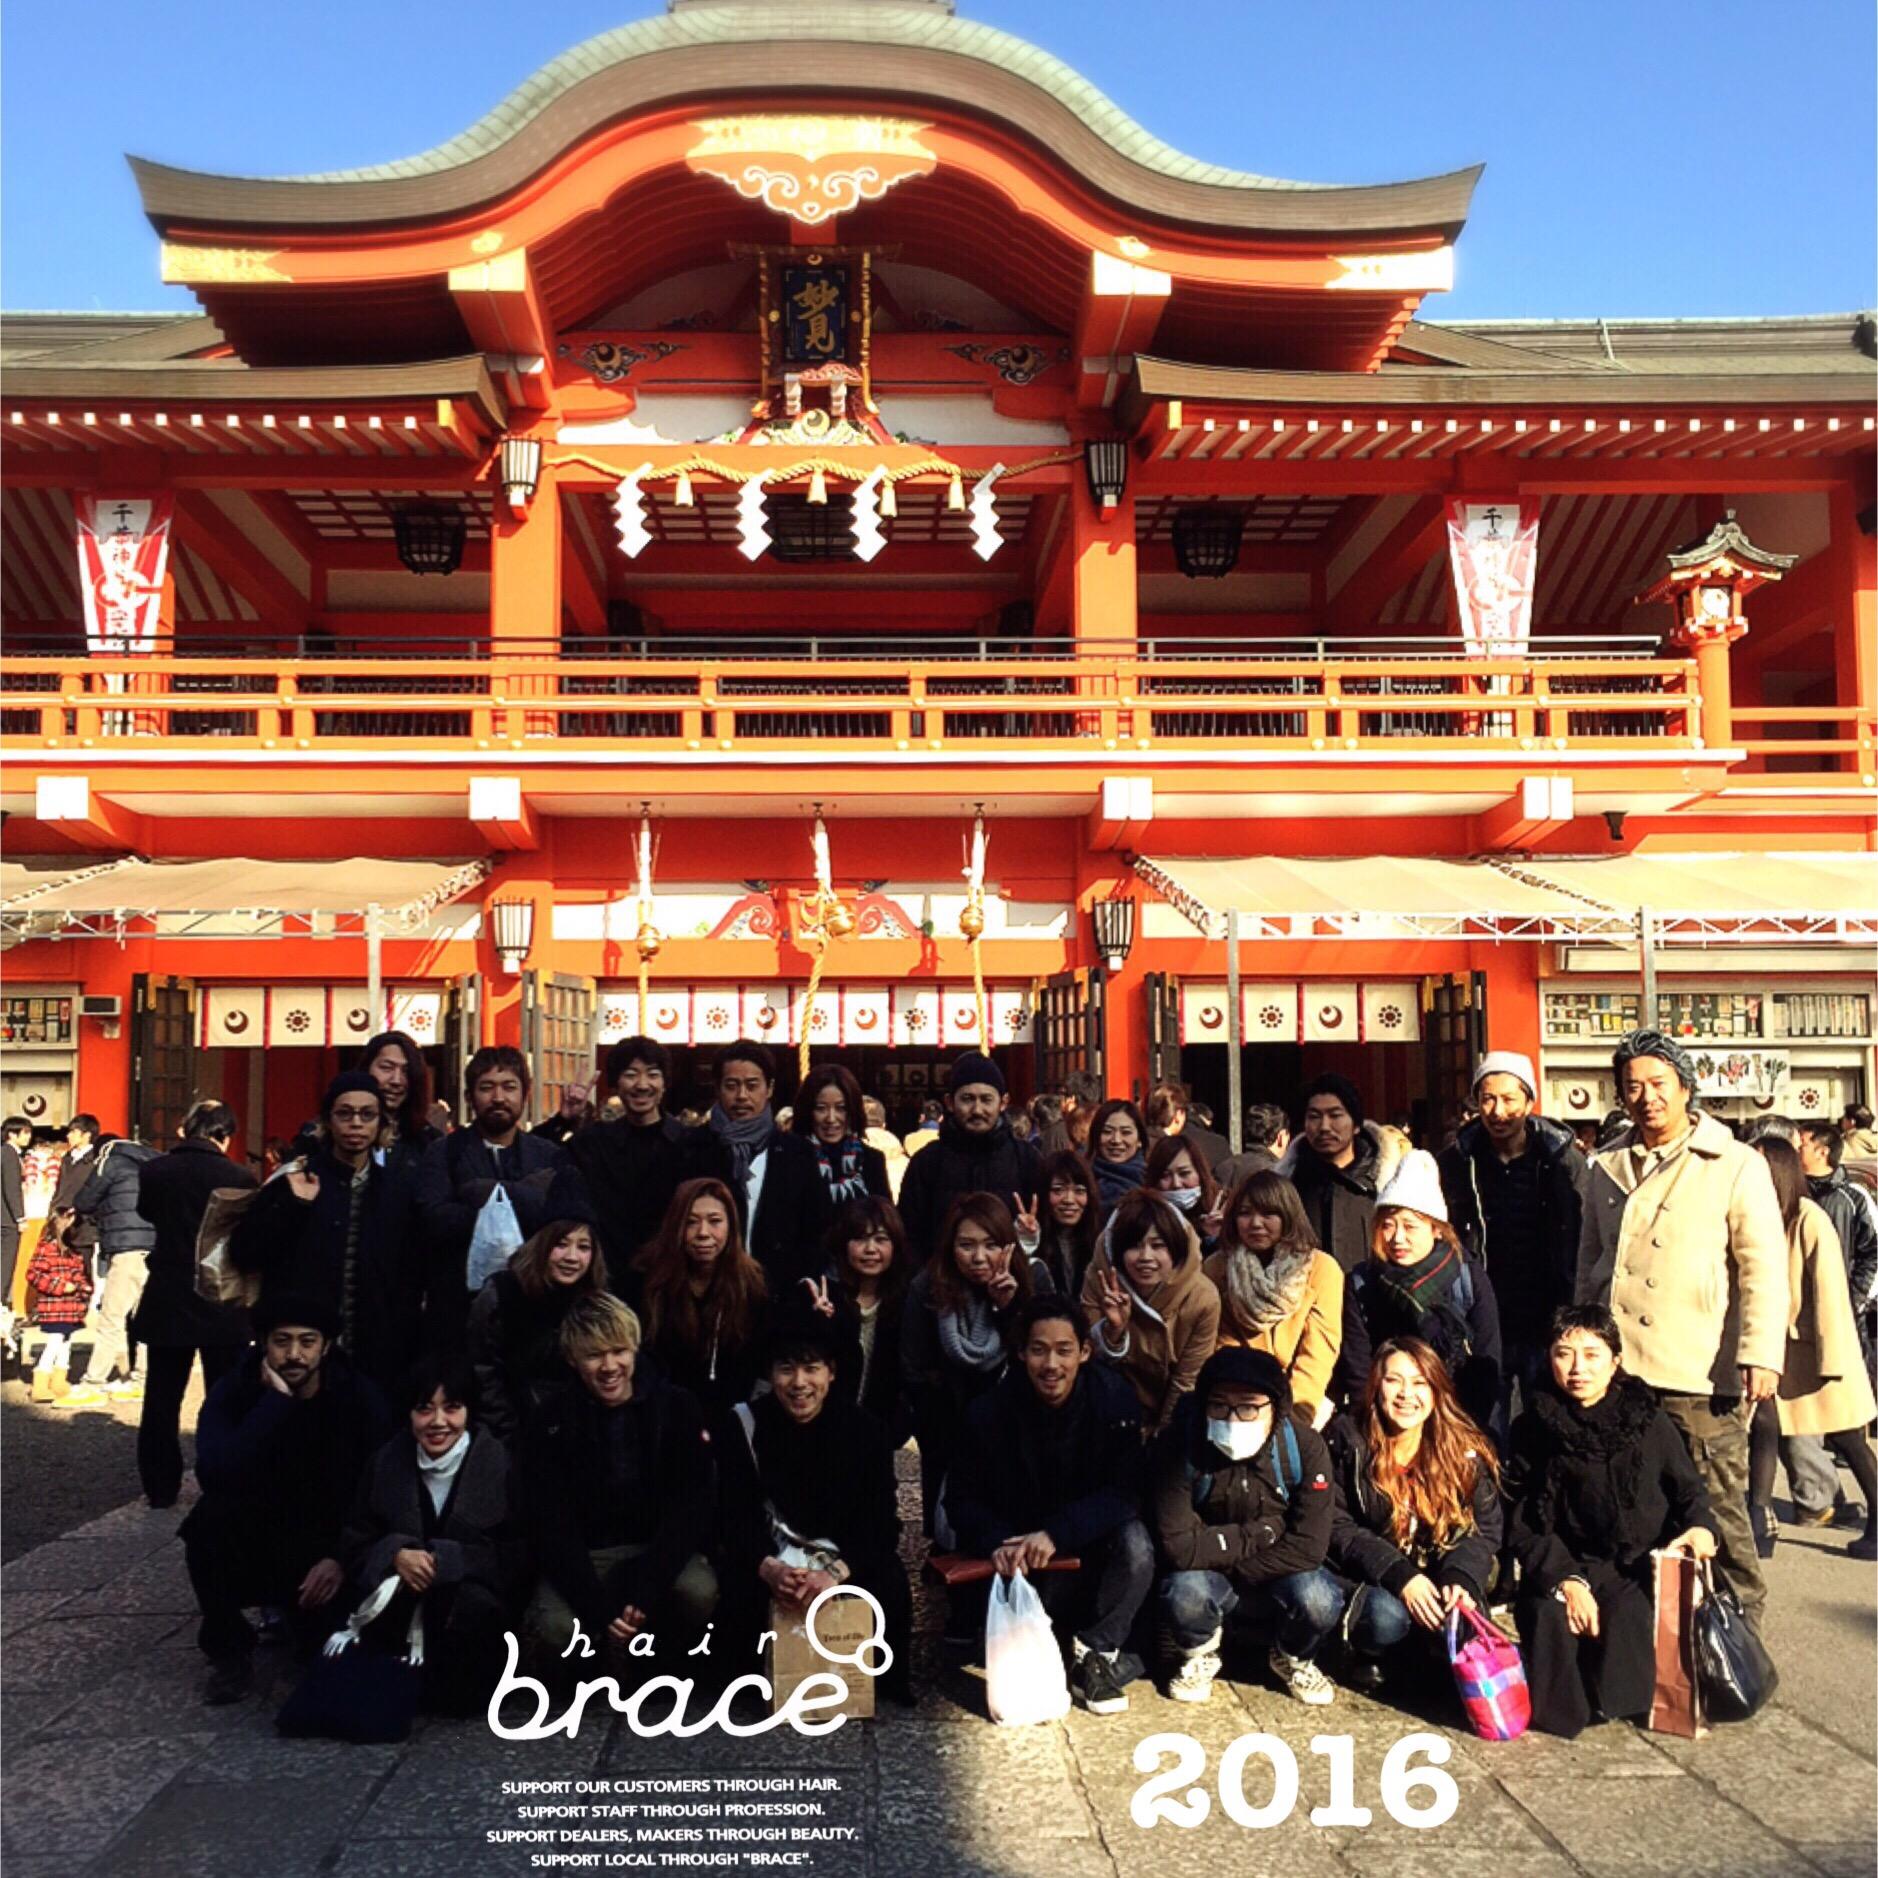 2016 hair brace 始動